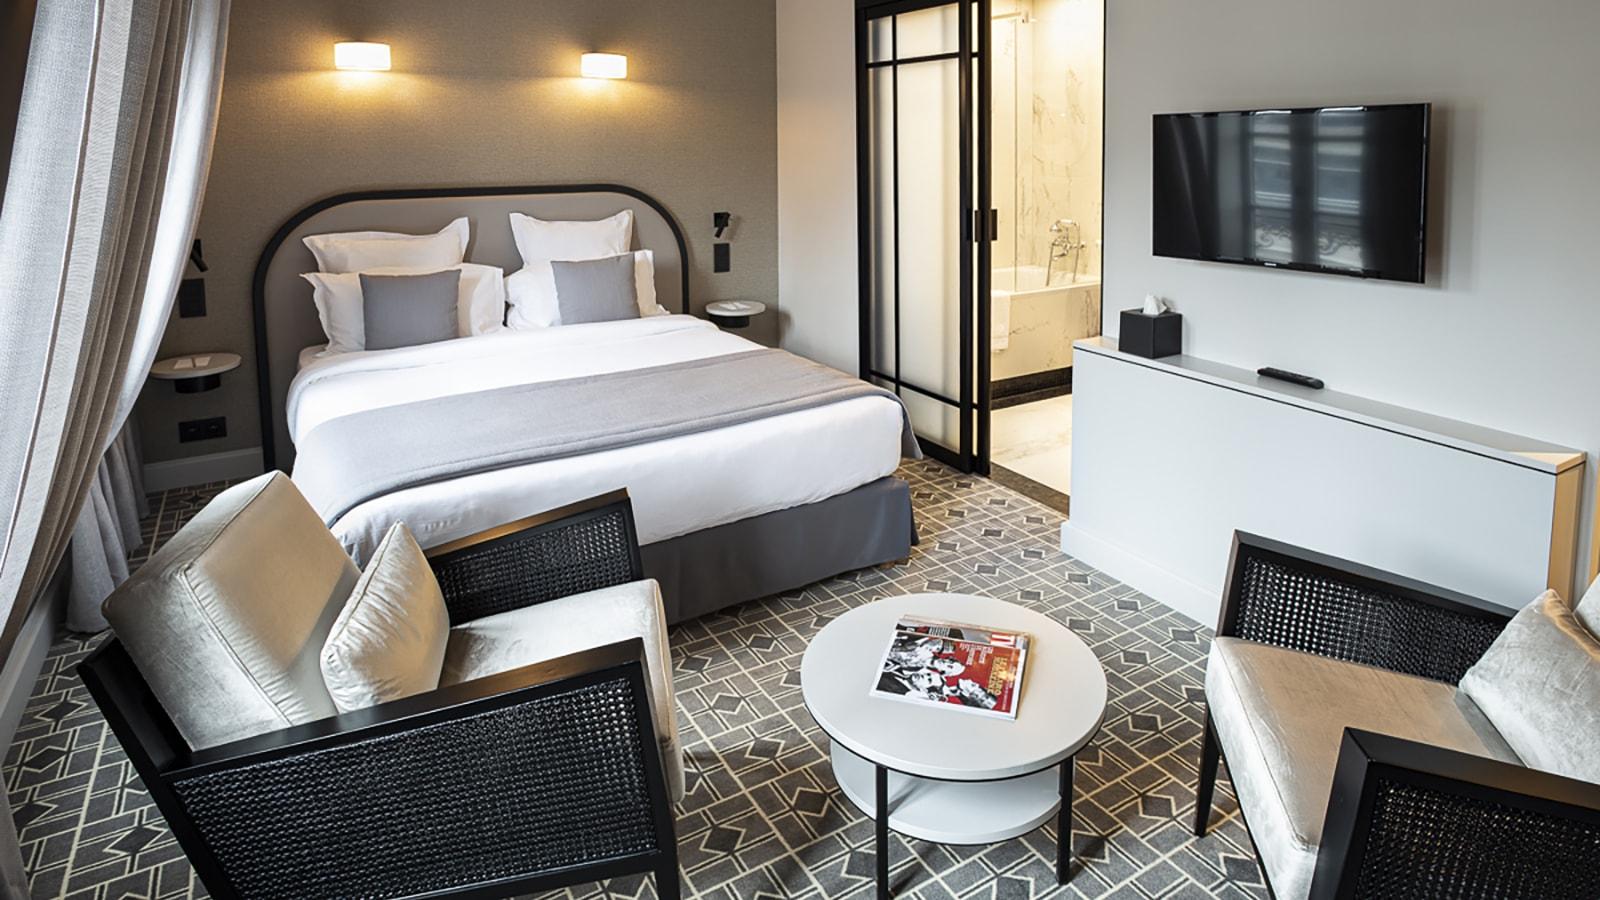 EFI Design Hotel Lenox Paris Efi Design (16) 1170